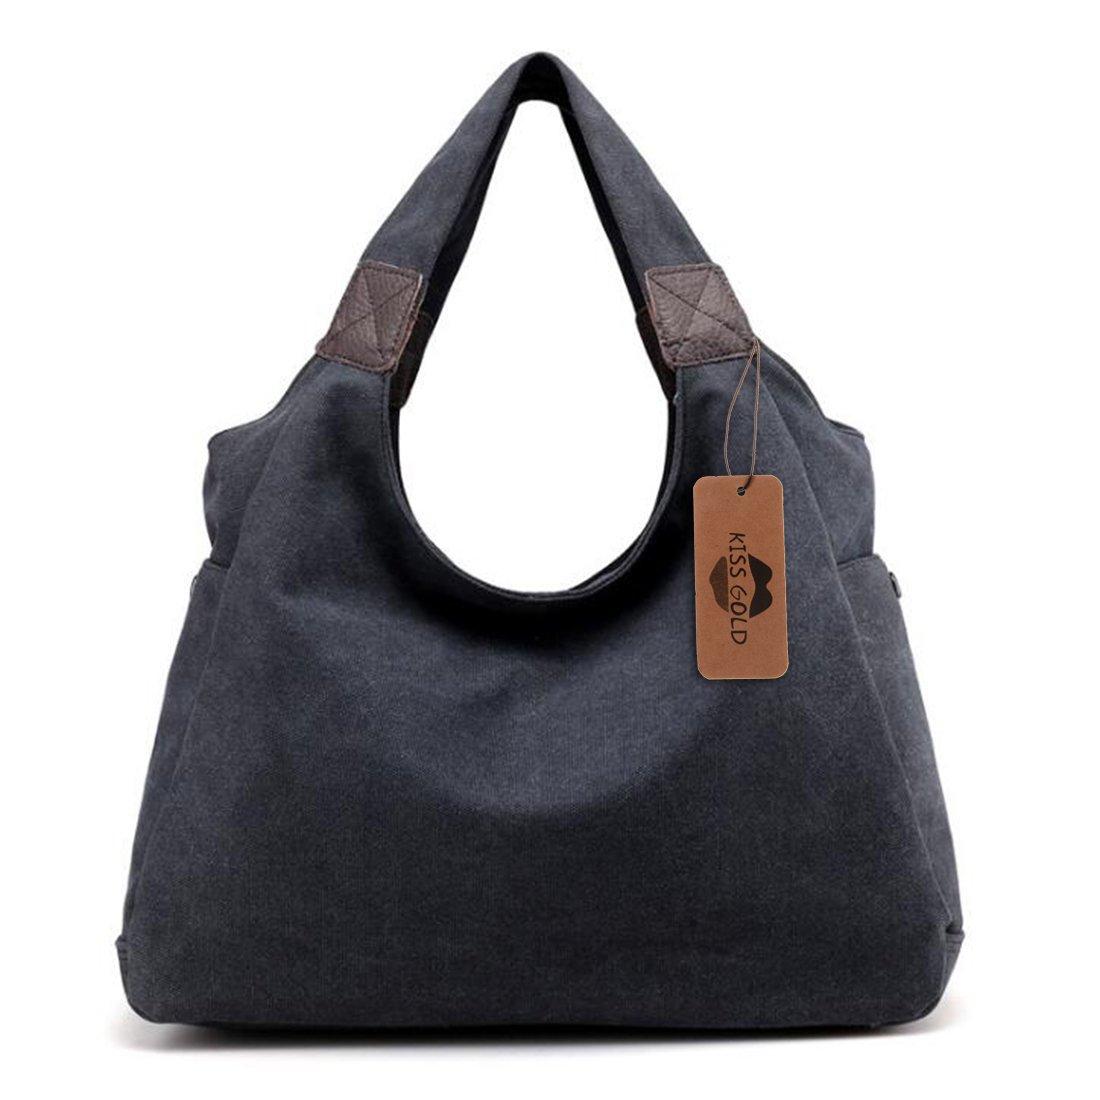 KISS GOLD(TM) Simple Style Canvas Tote Hobo Bag Shopper Handbag For Womens, Model B-Black